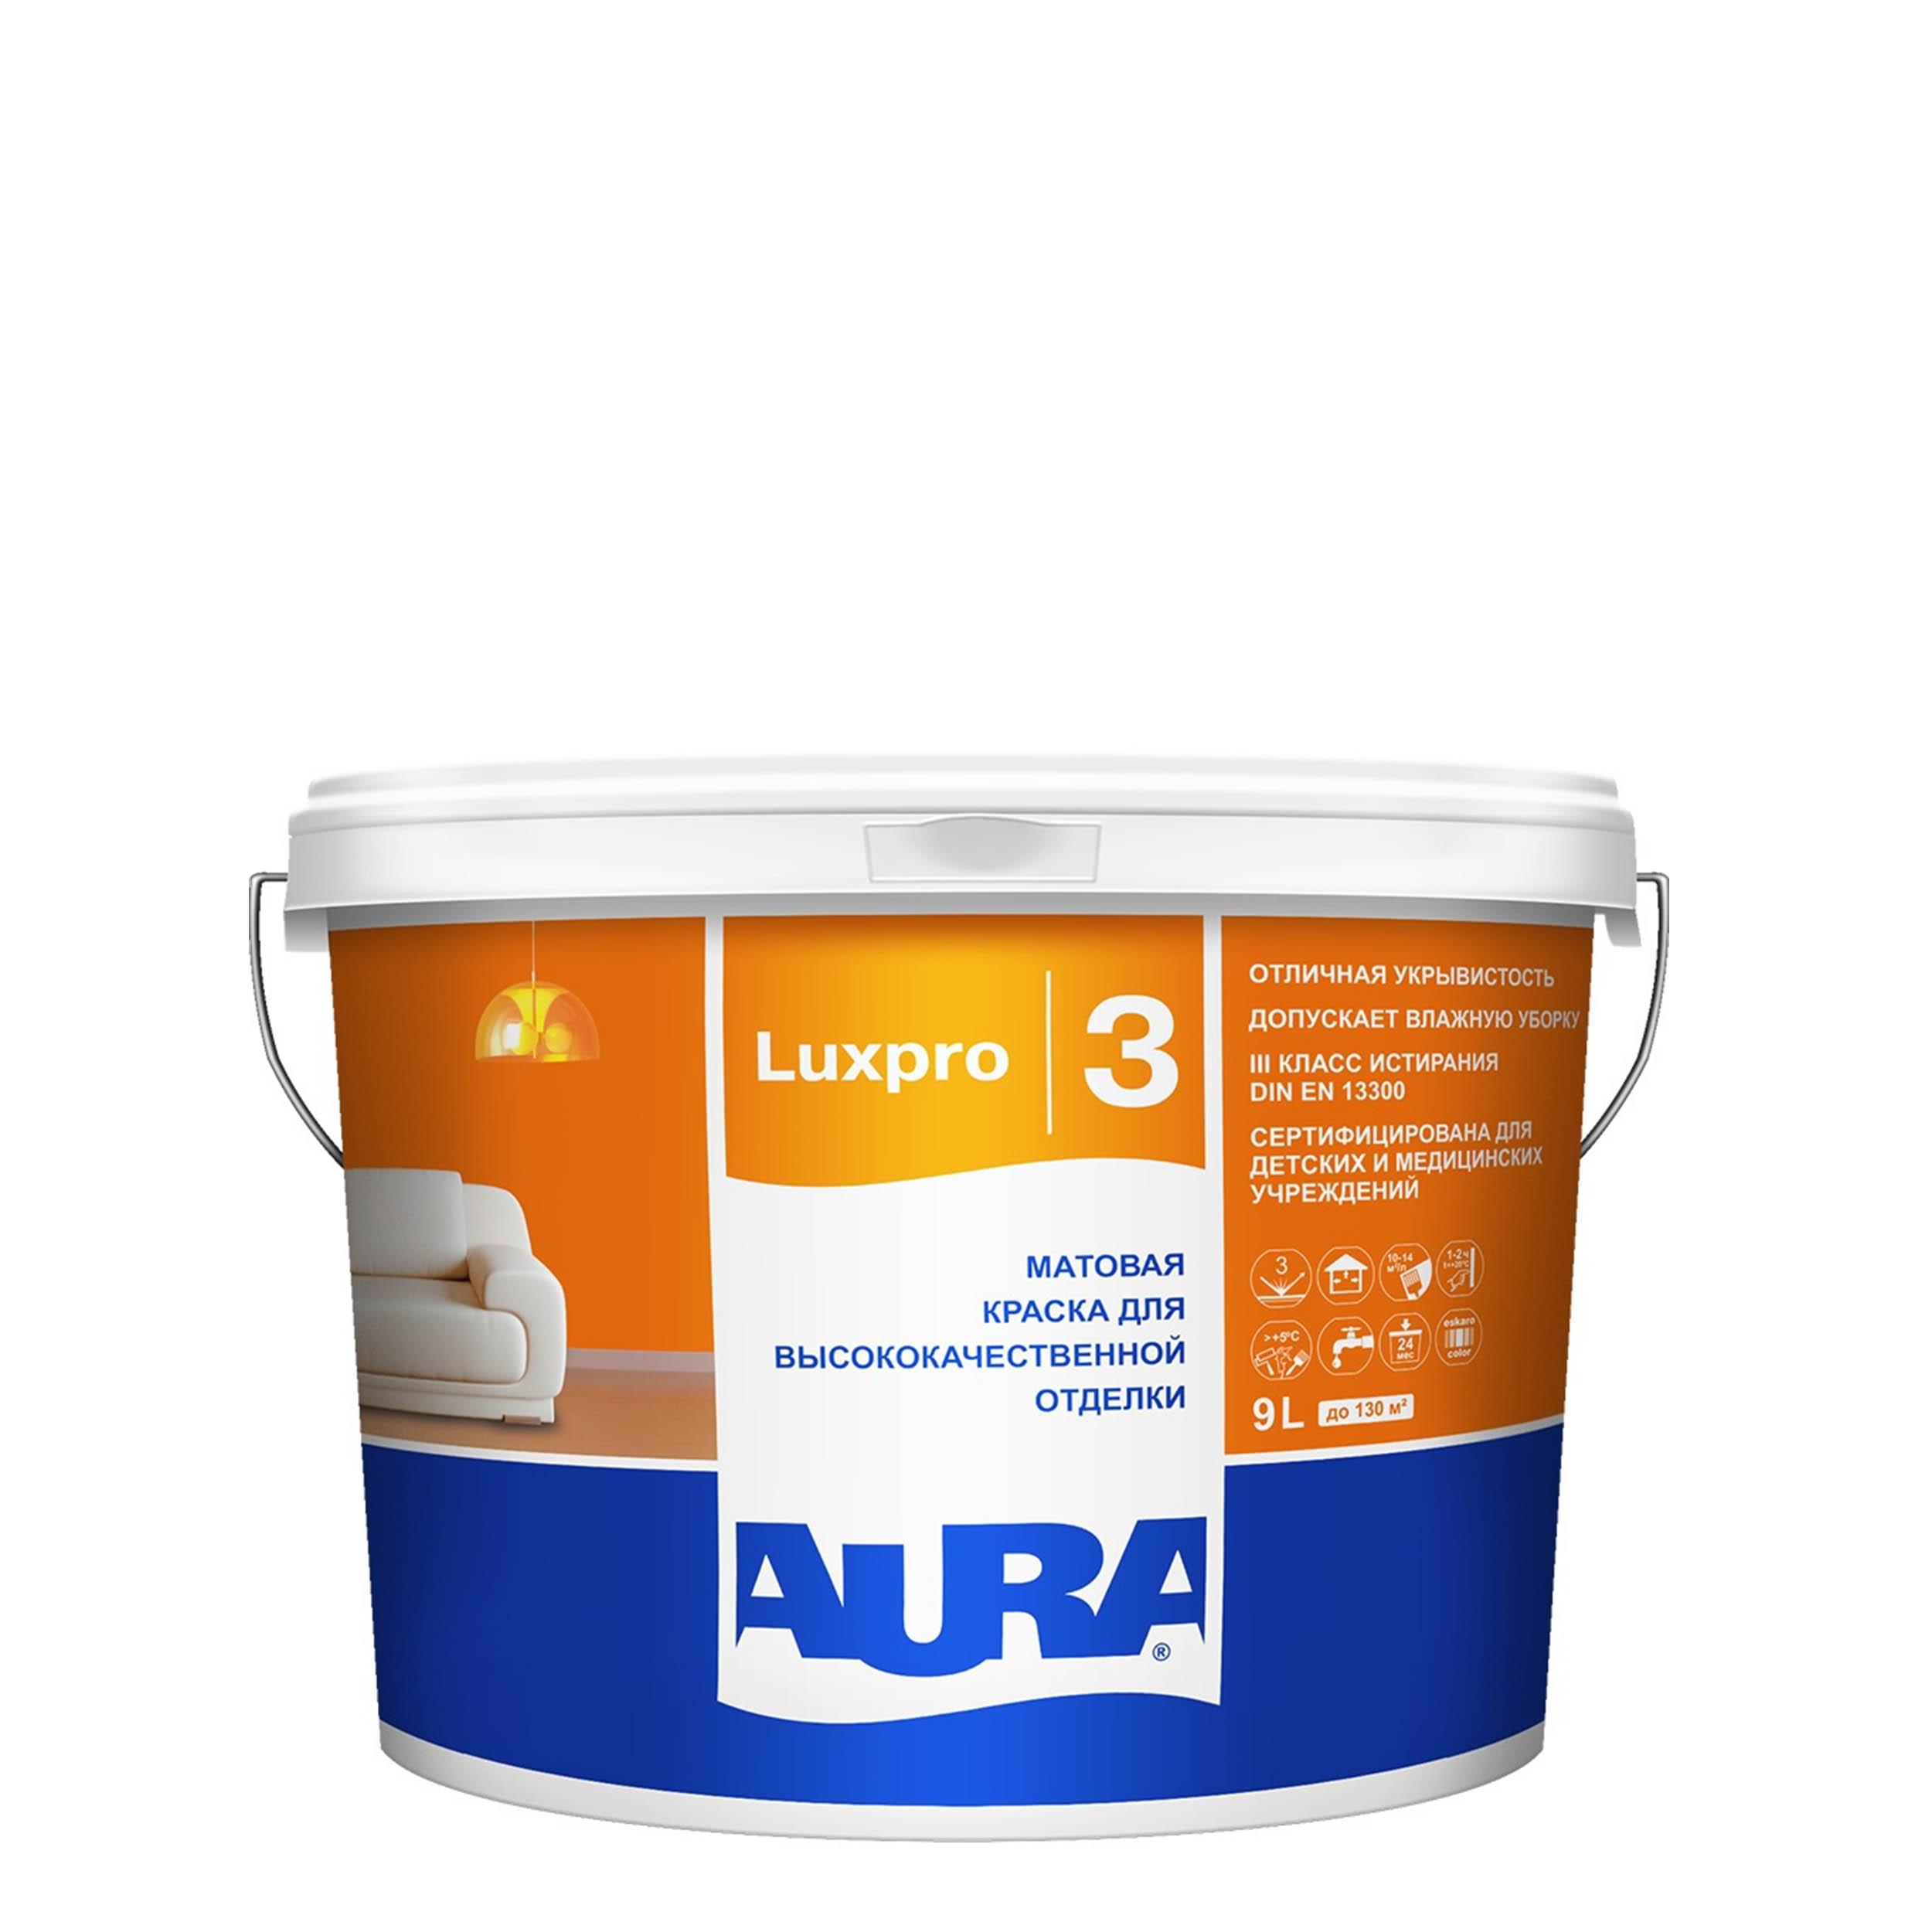 Фото 4 - Краска интерьерная, Aura LuxPRO 3, RAL 8008, 11 кг.